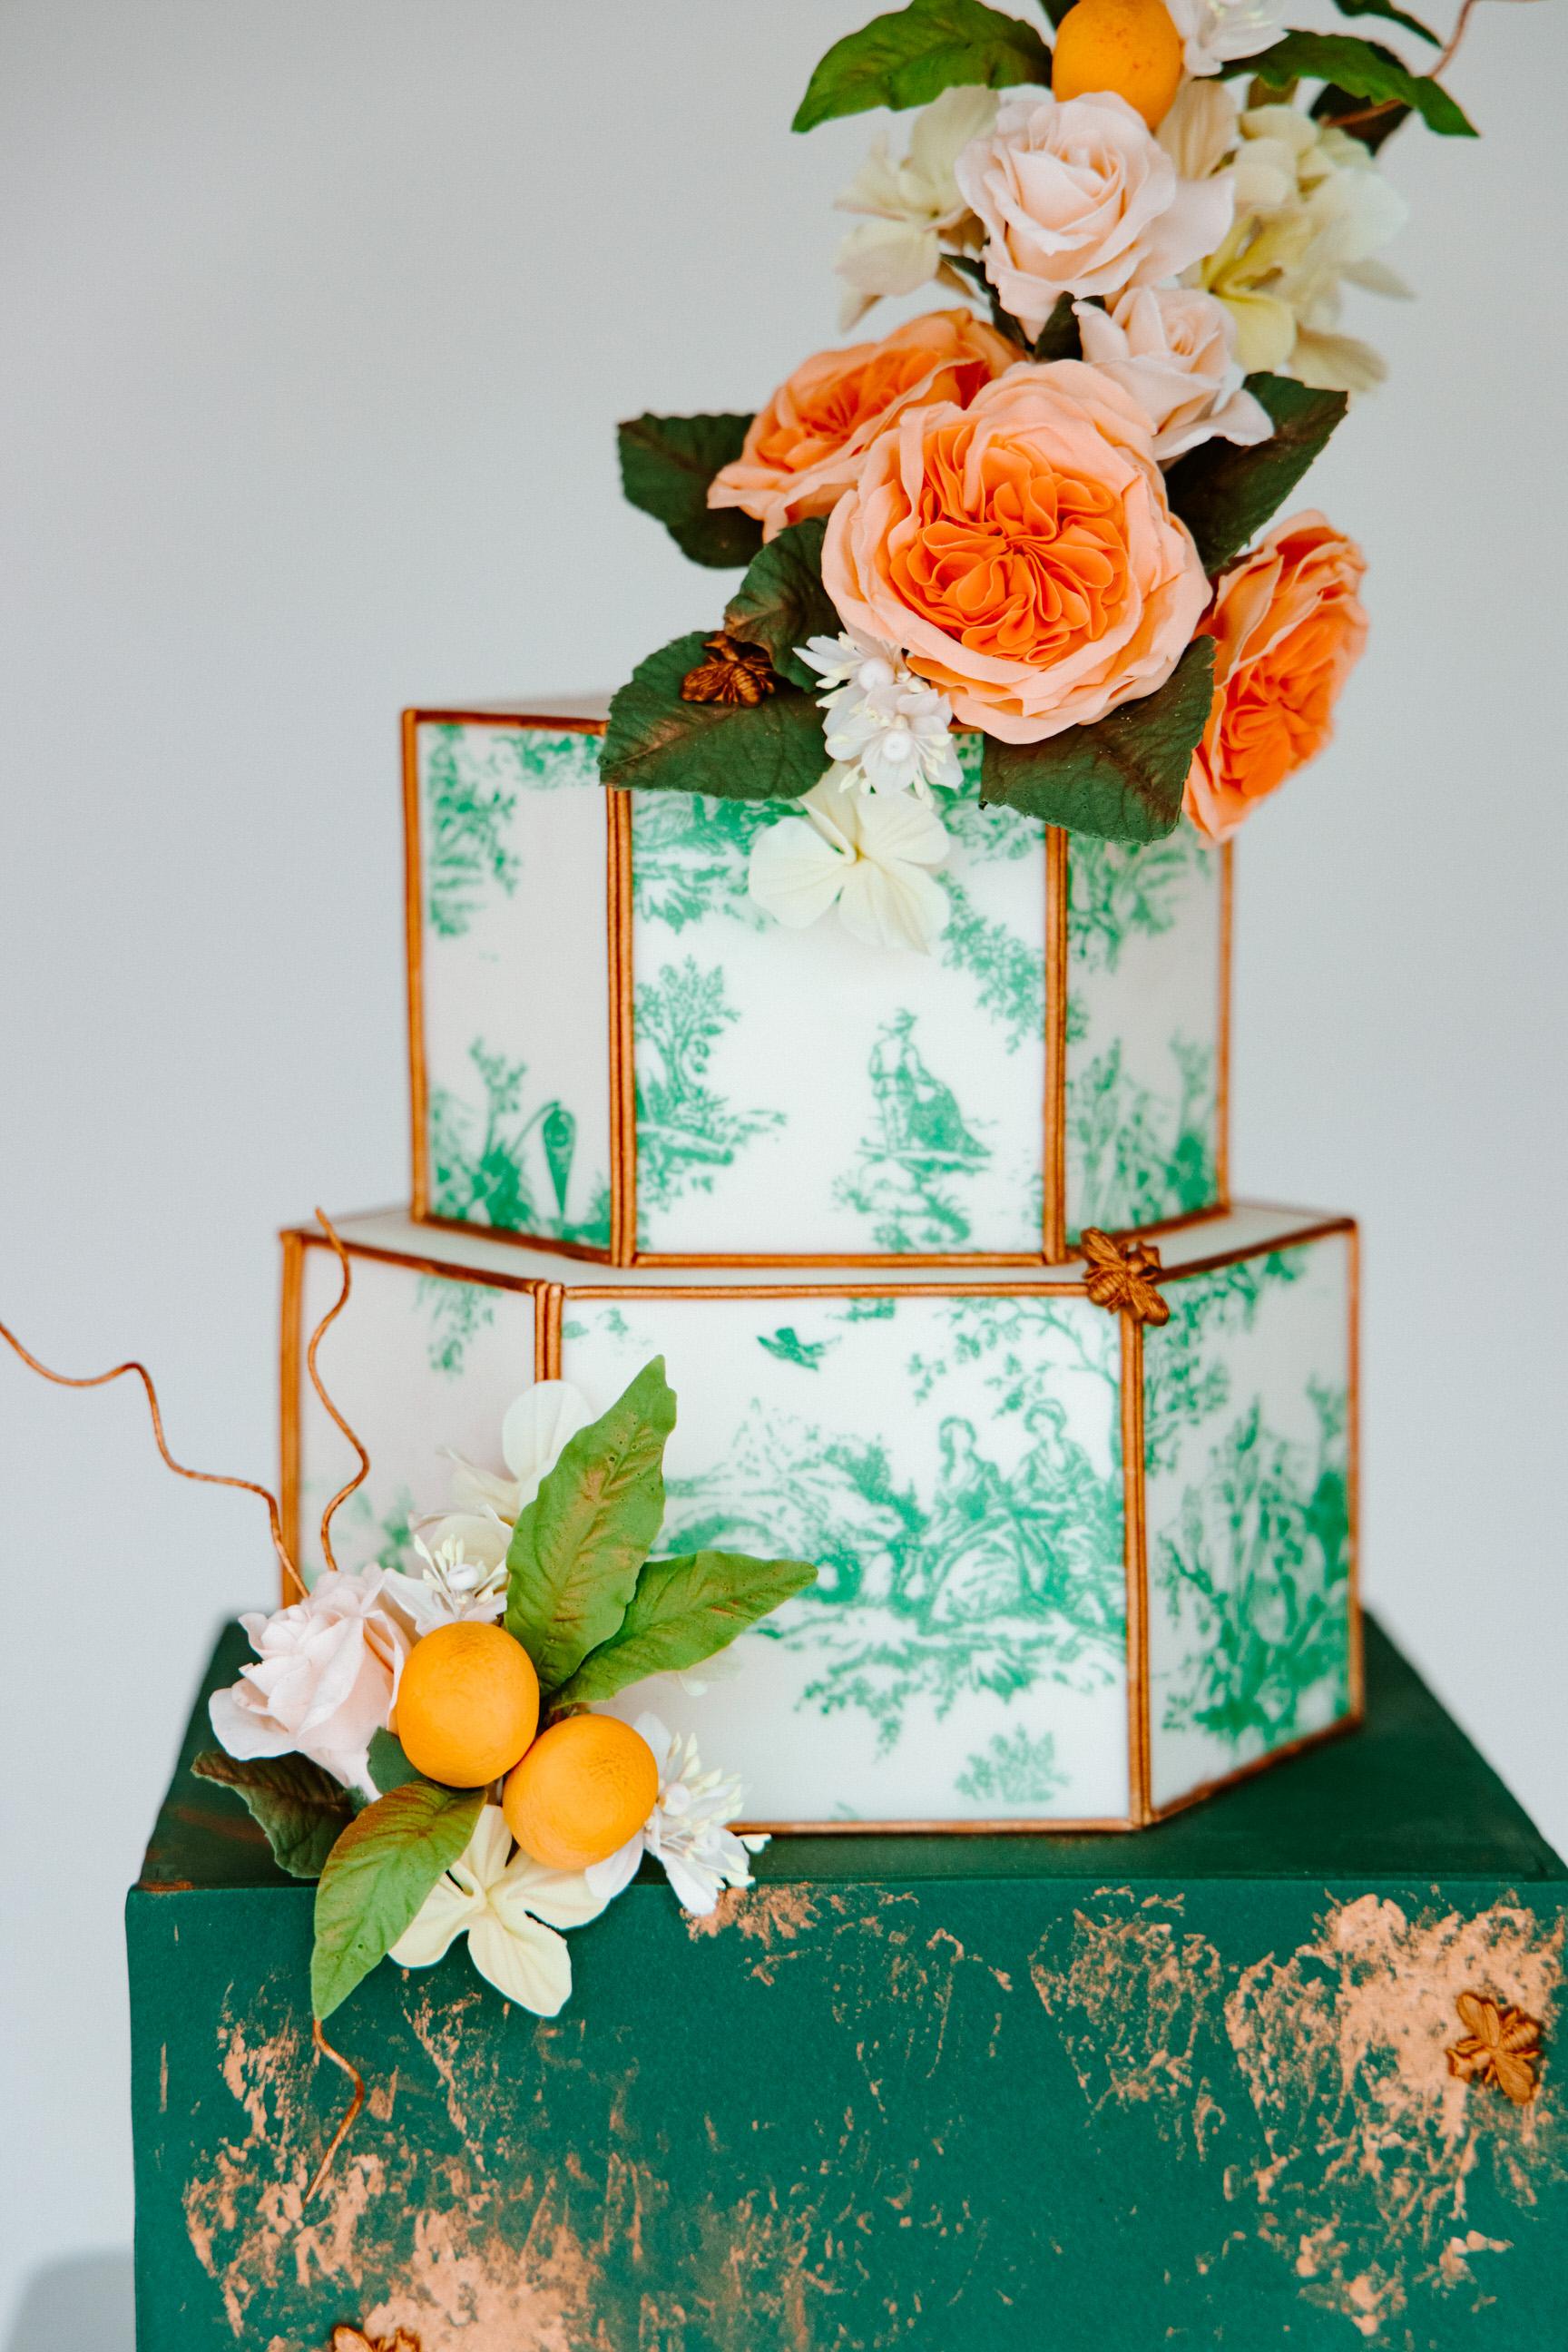 gateaux-cake-7351.jpg